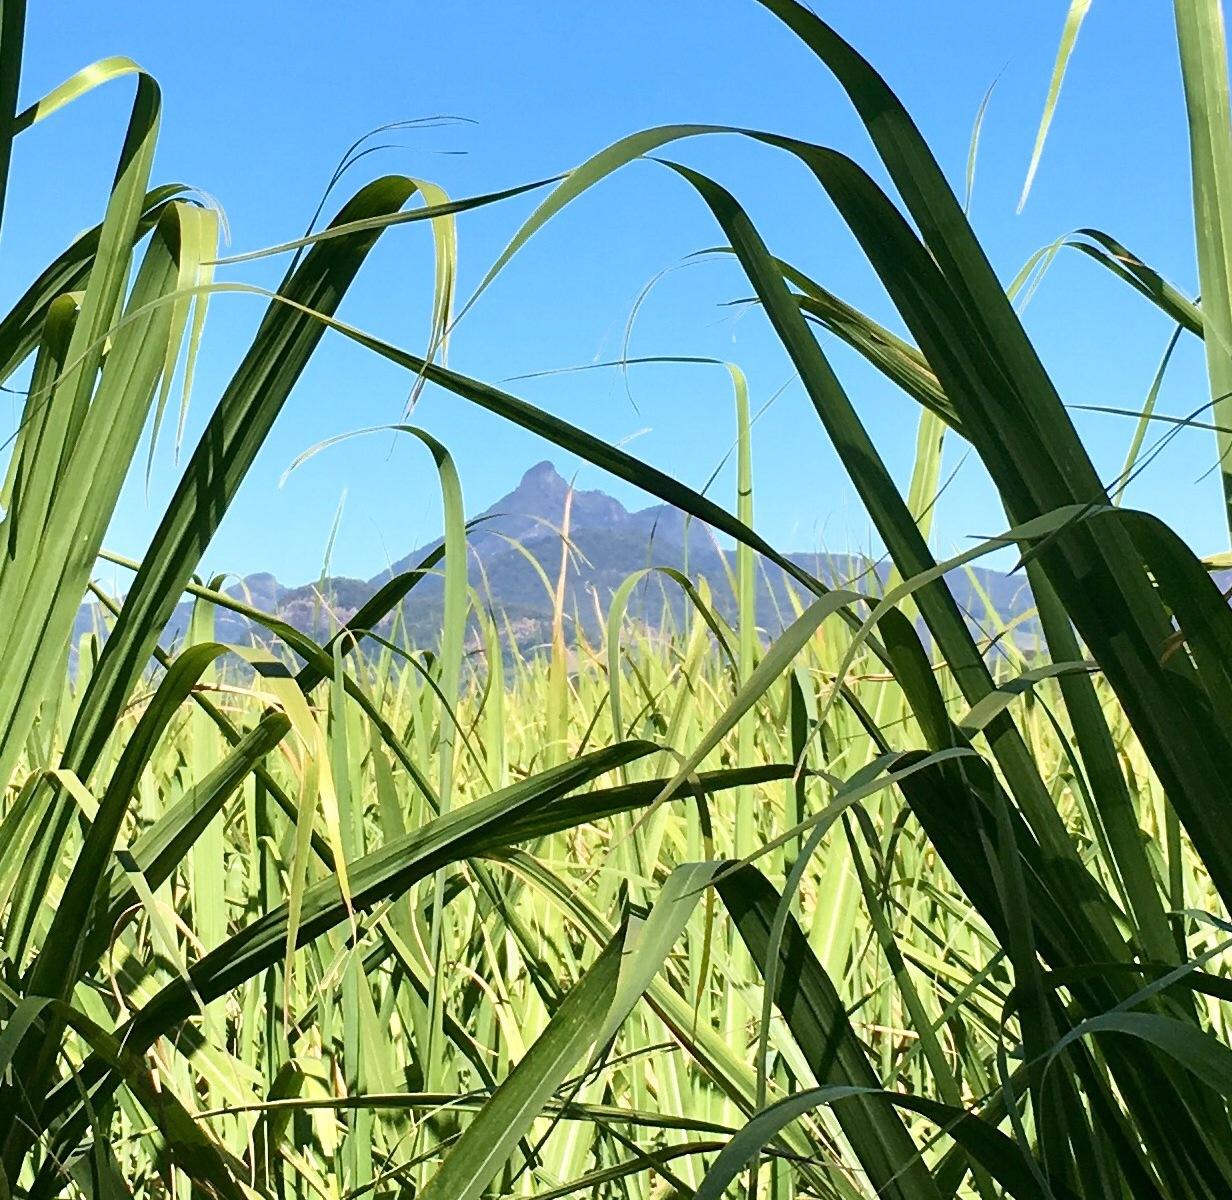 Mt Warning framed by cane fields